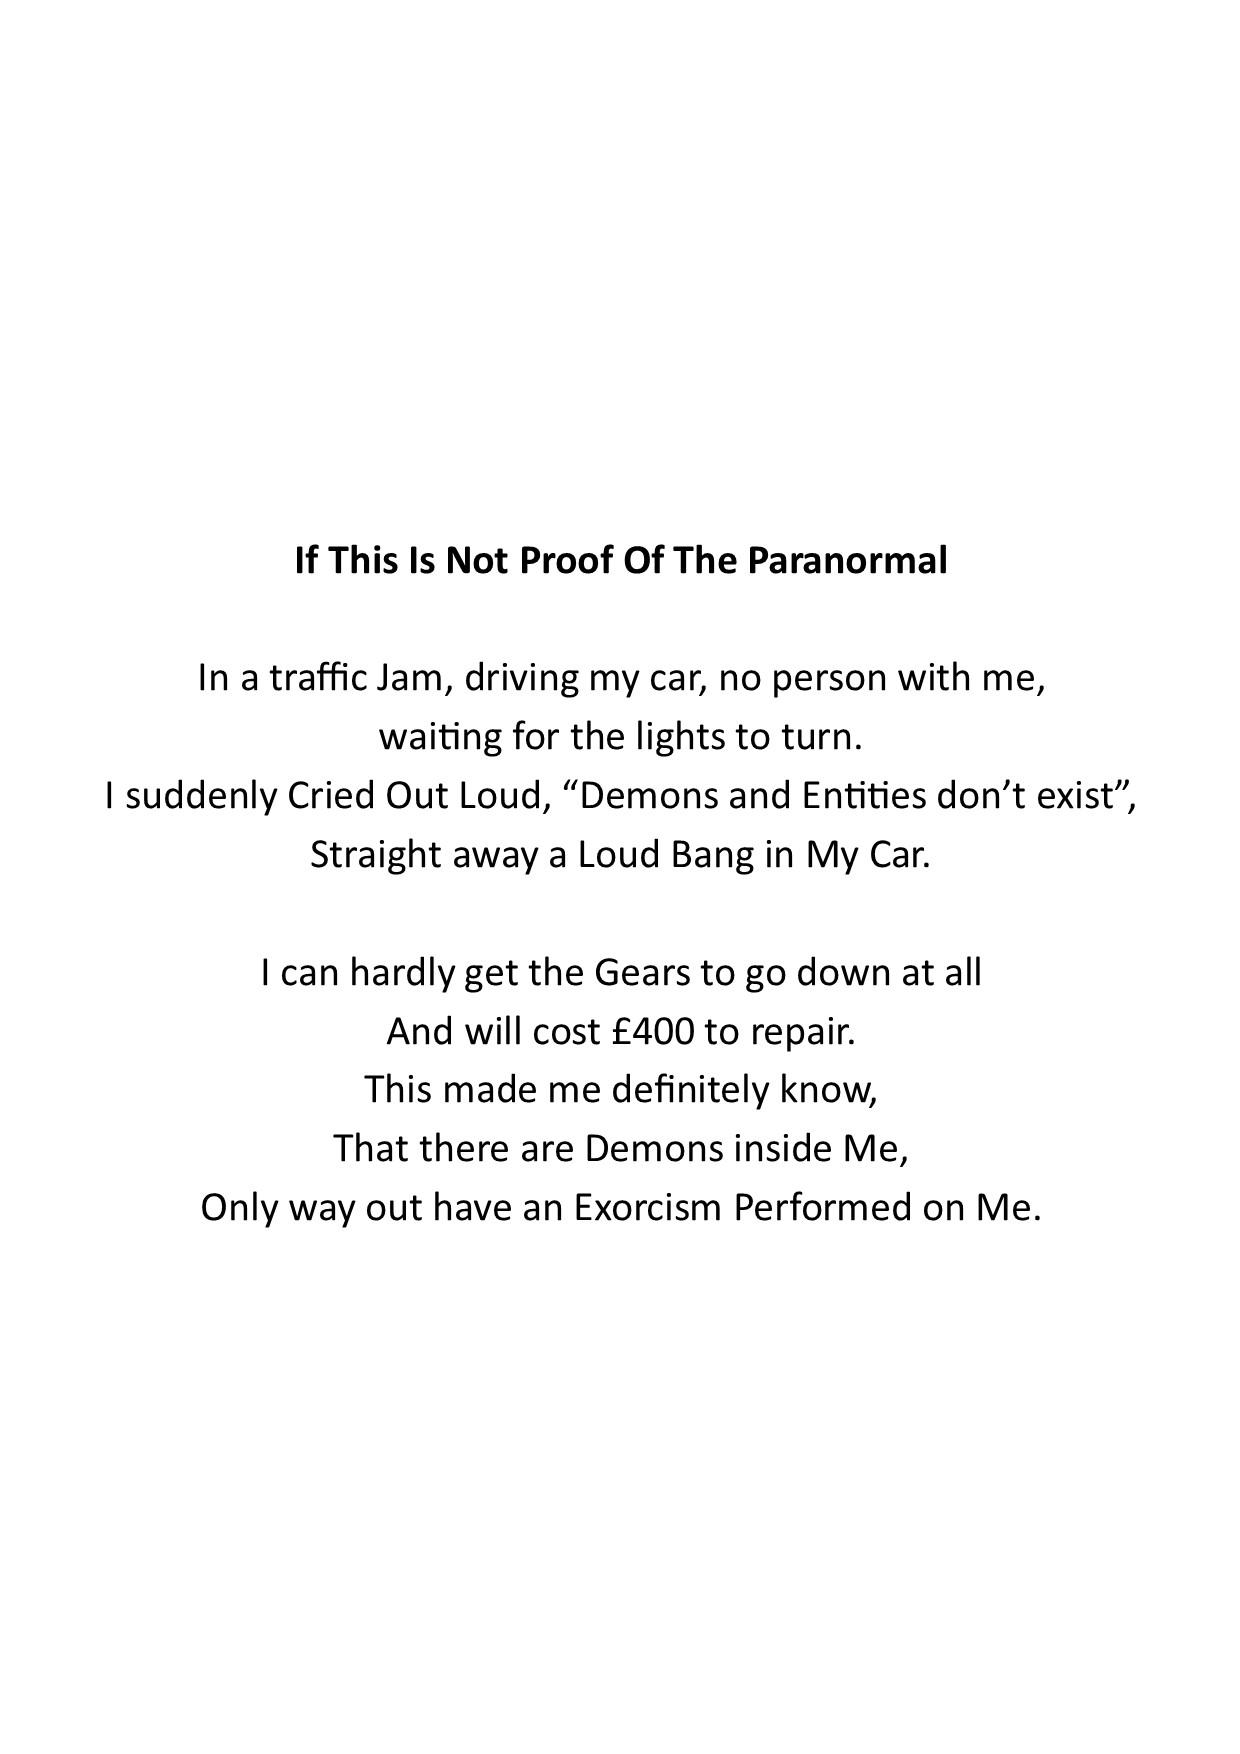 Proof of Paranormal_Website.jpg